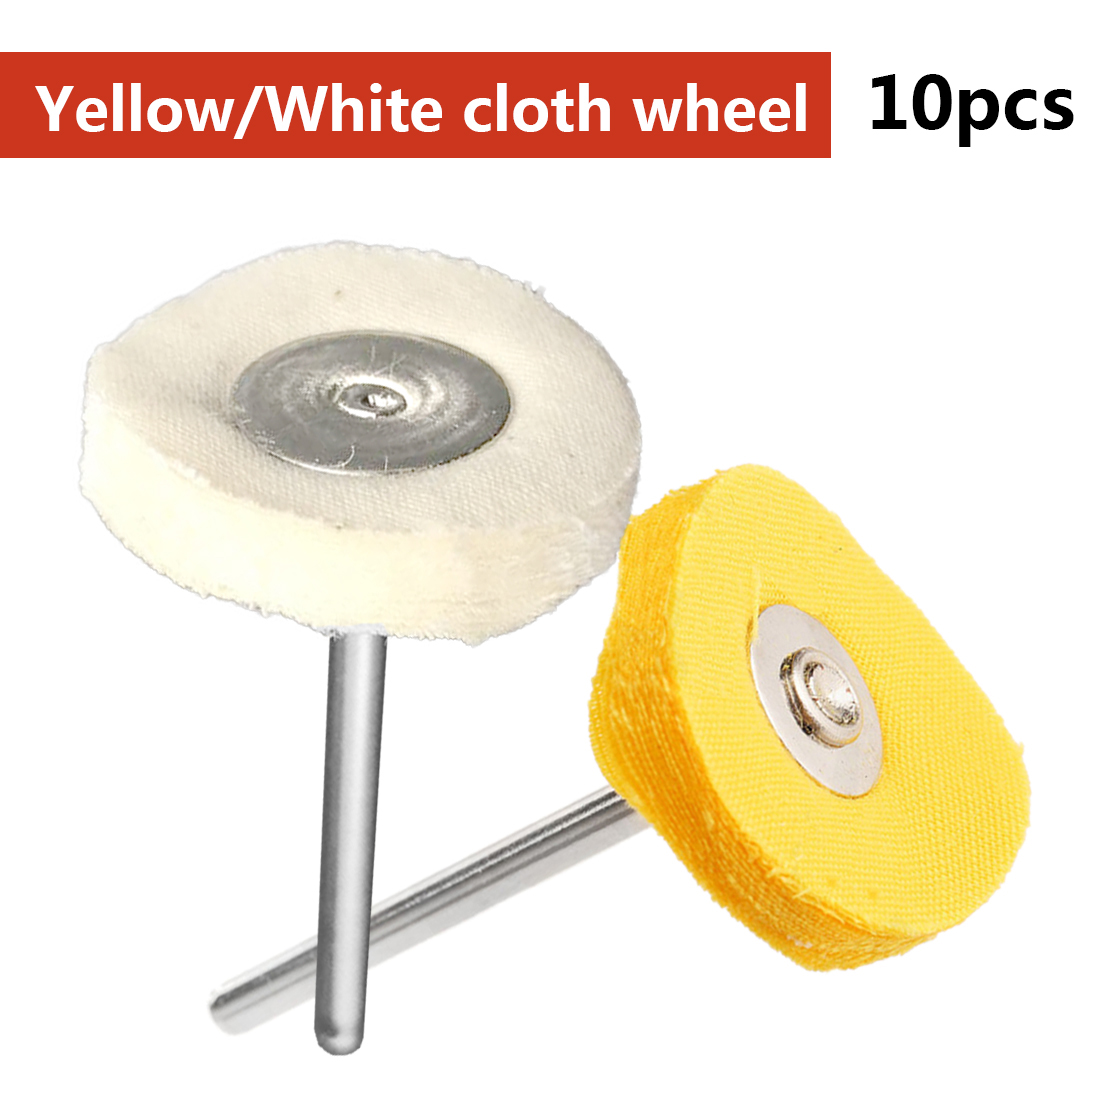 10pcs/set Polishing Wheel Buffing Pad Brush Set for Jewelry Jade Hardware Dremel Accessories for Power Rotary Tools